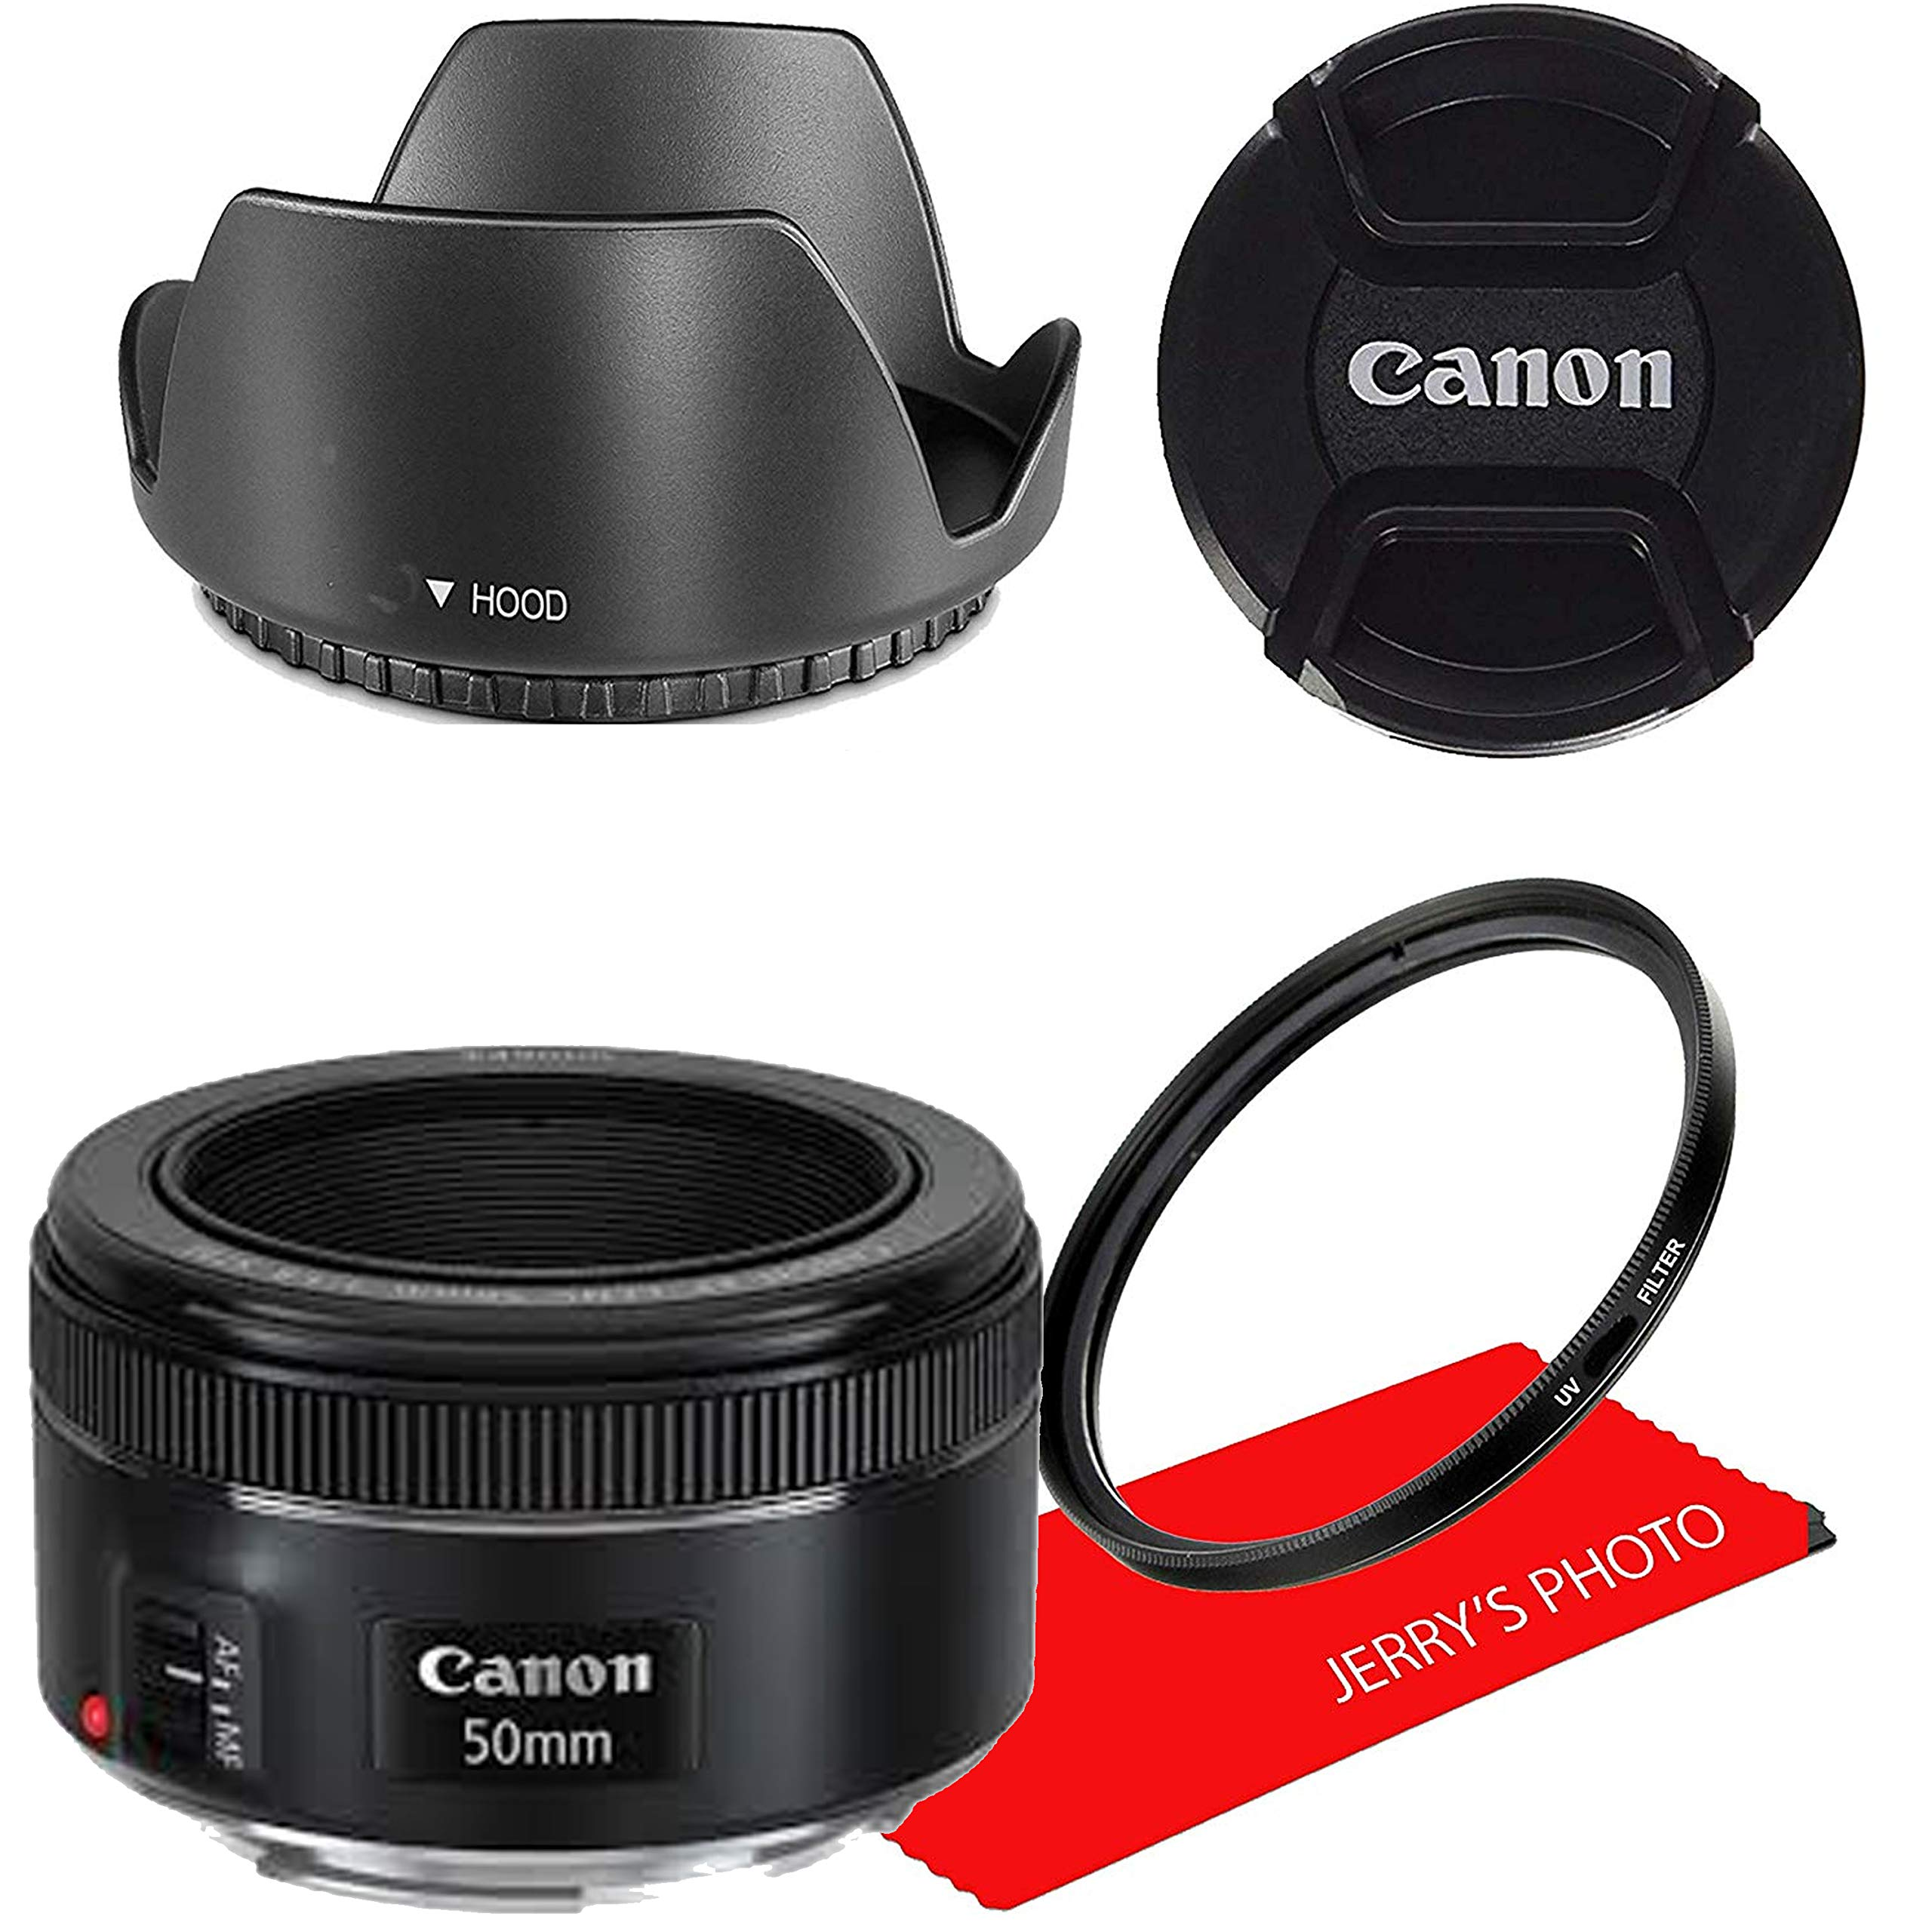 CanonEF 50mm f/1.8 STM Lens